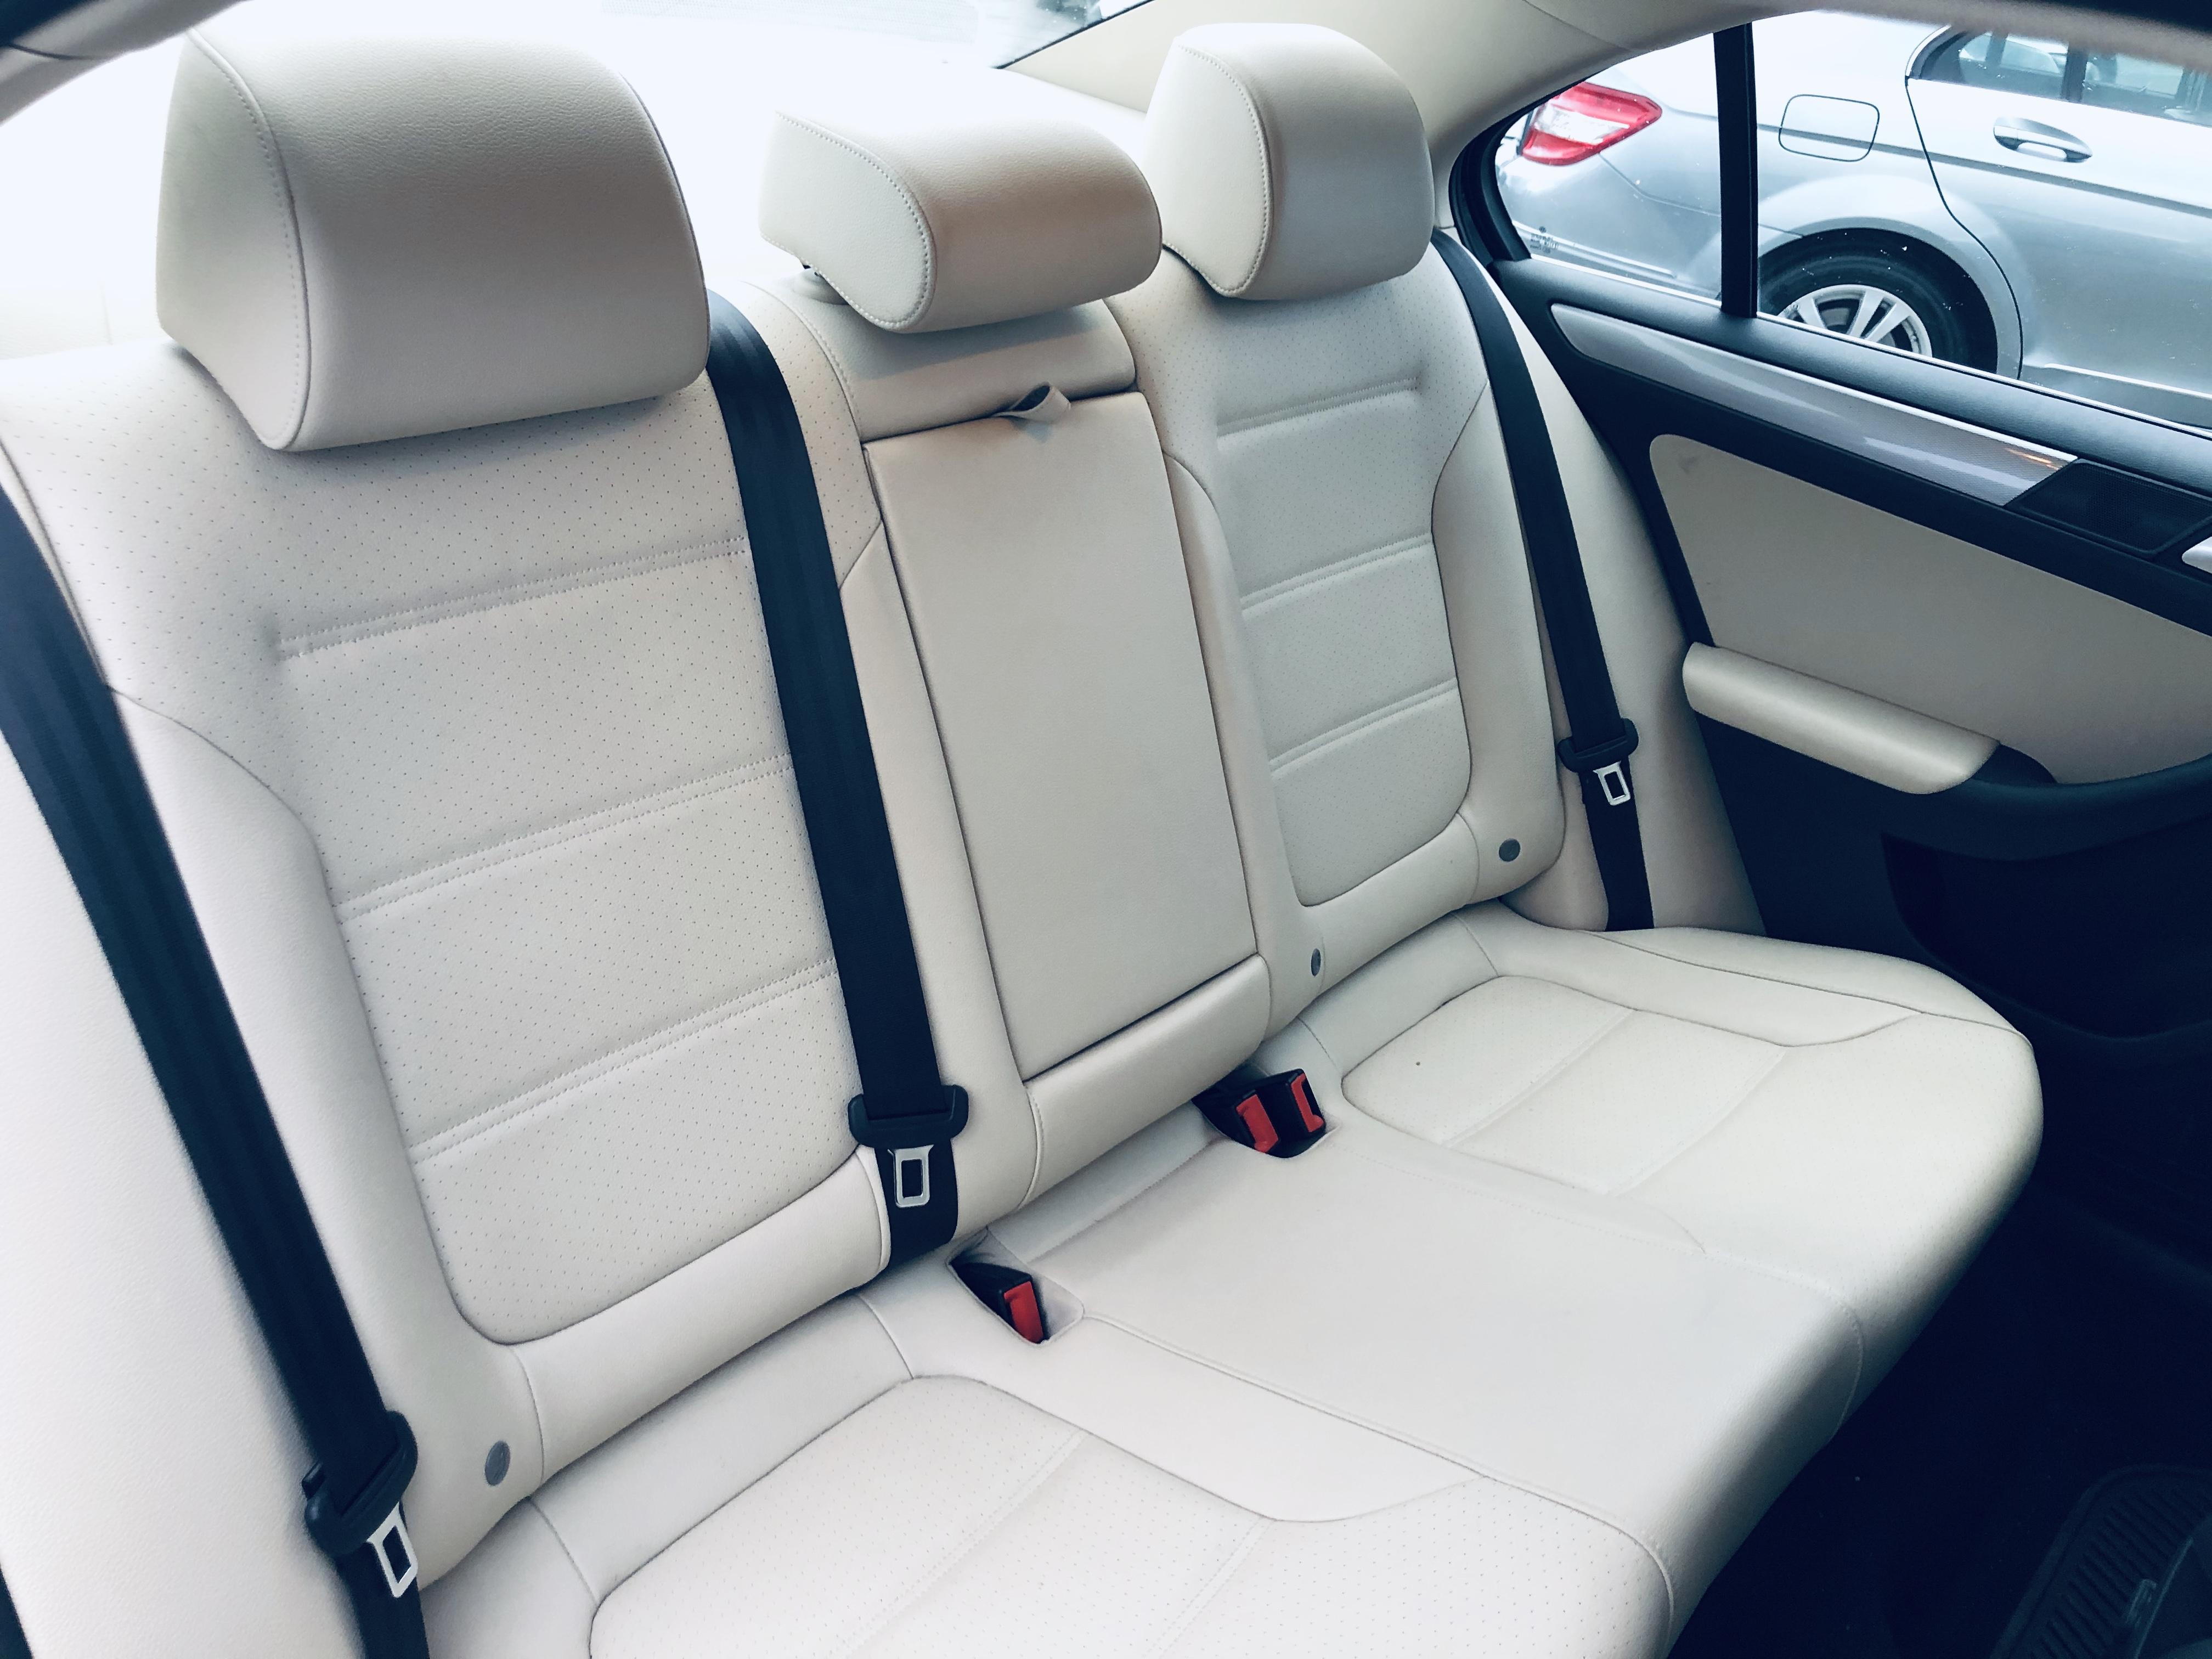 Volkswagen Jetta 1.4(lt) 2016 Подержанный  $10800